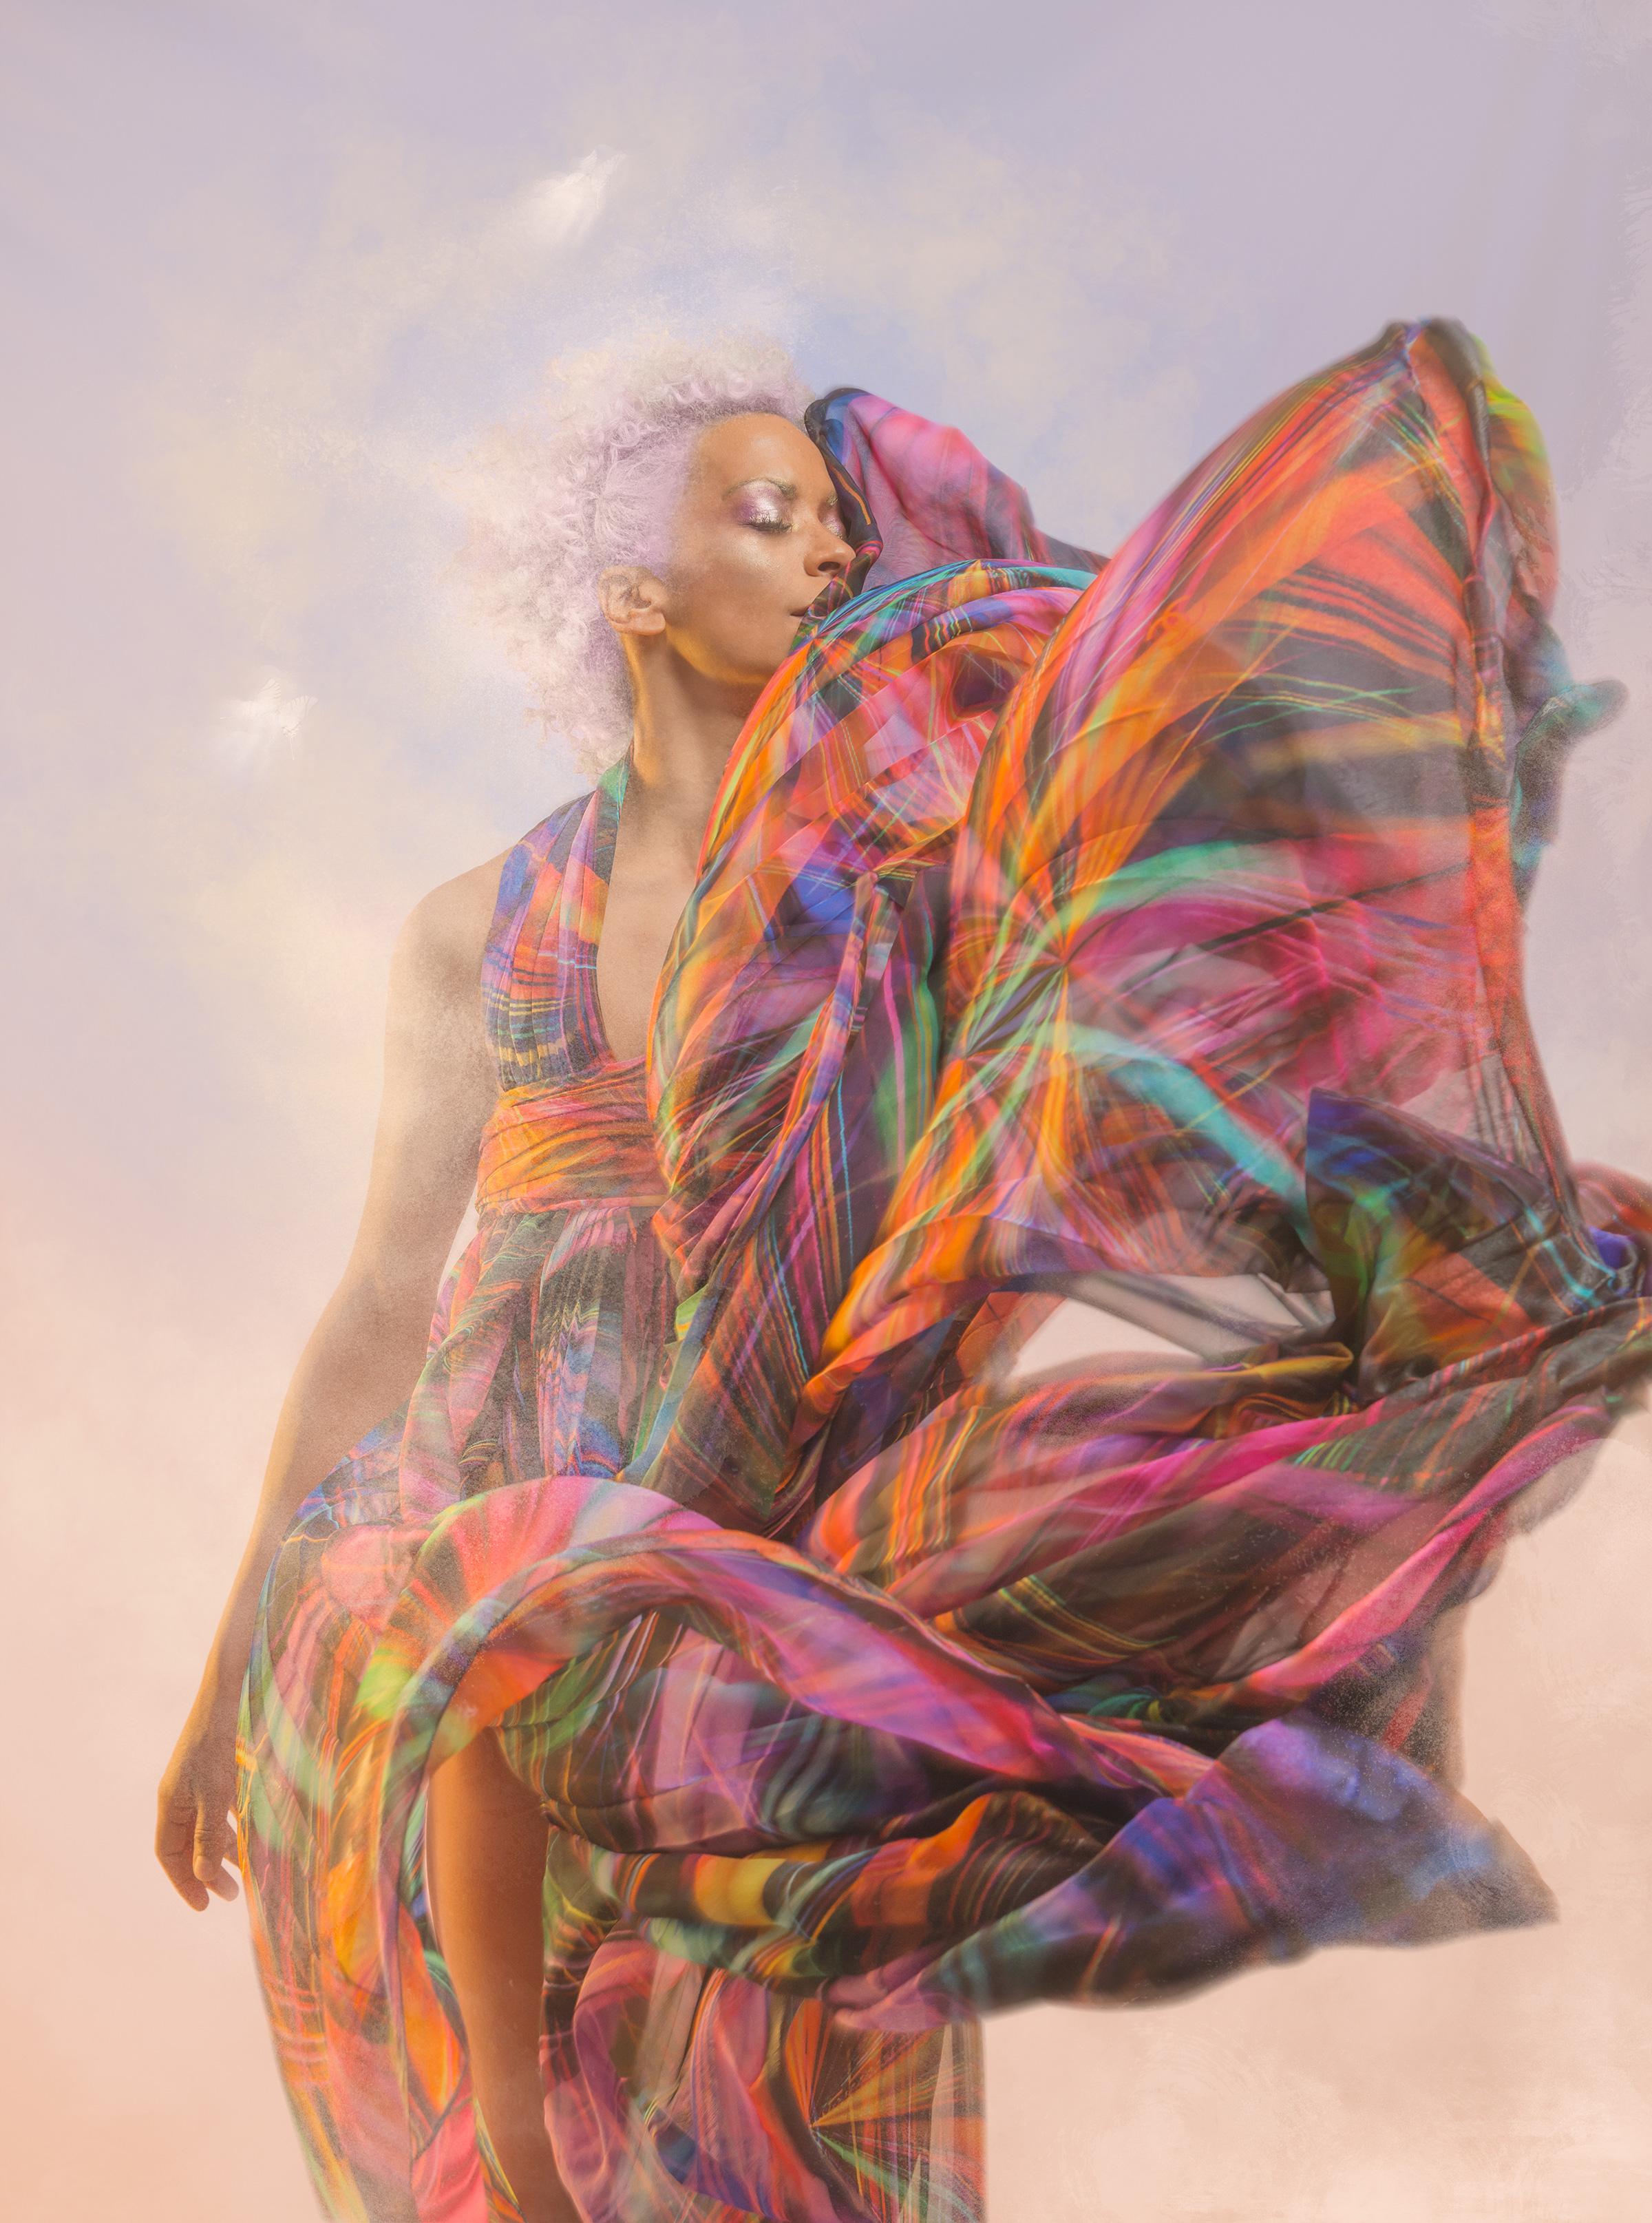 @Thefashionablelampoon #fashion magazine #dancer @vanity_fairr @Channel.jpg